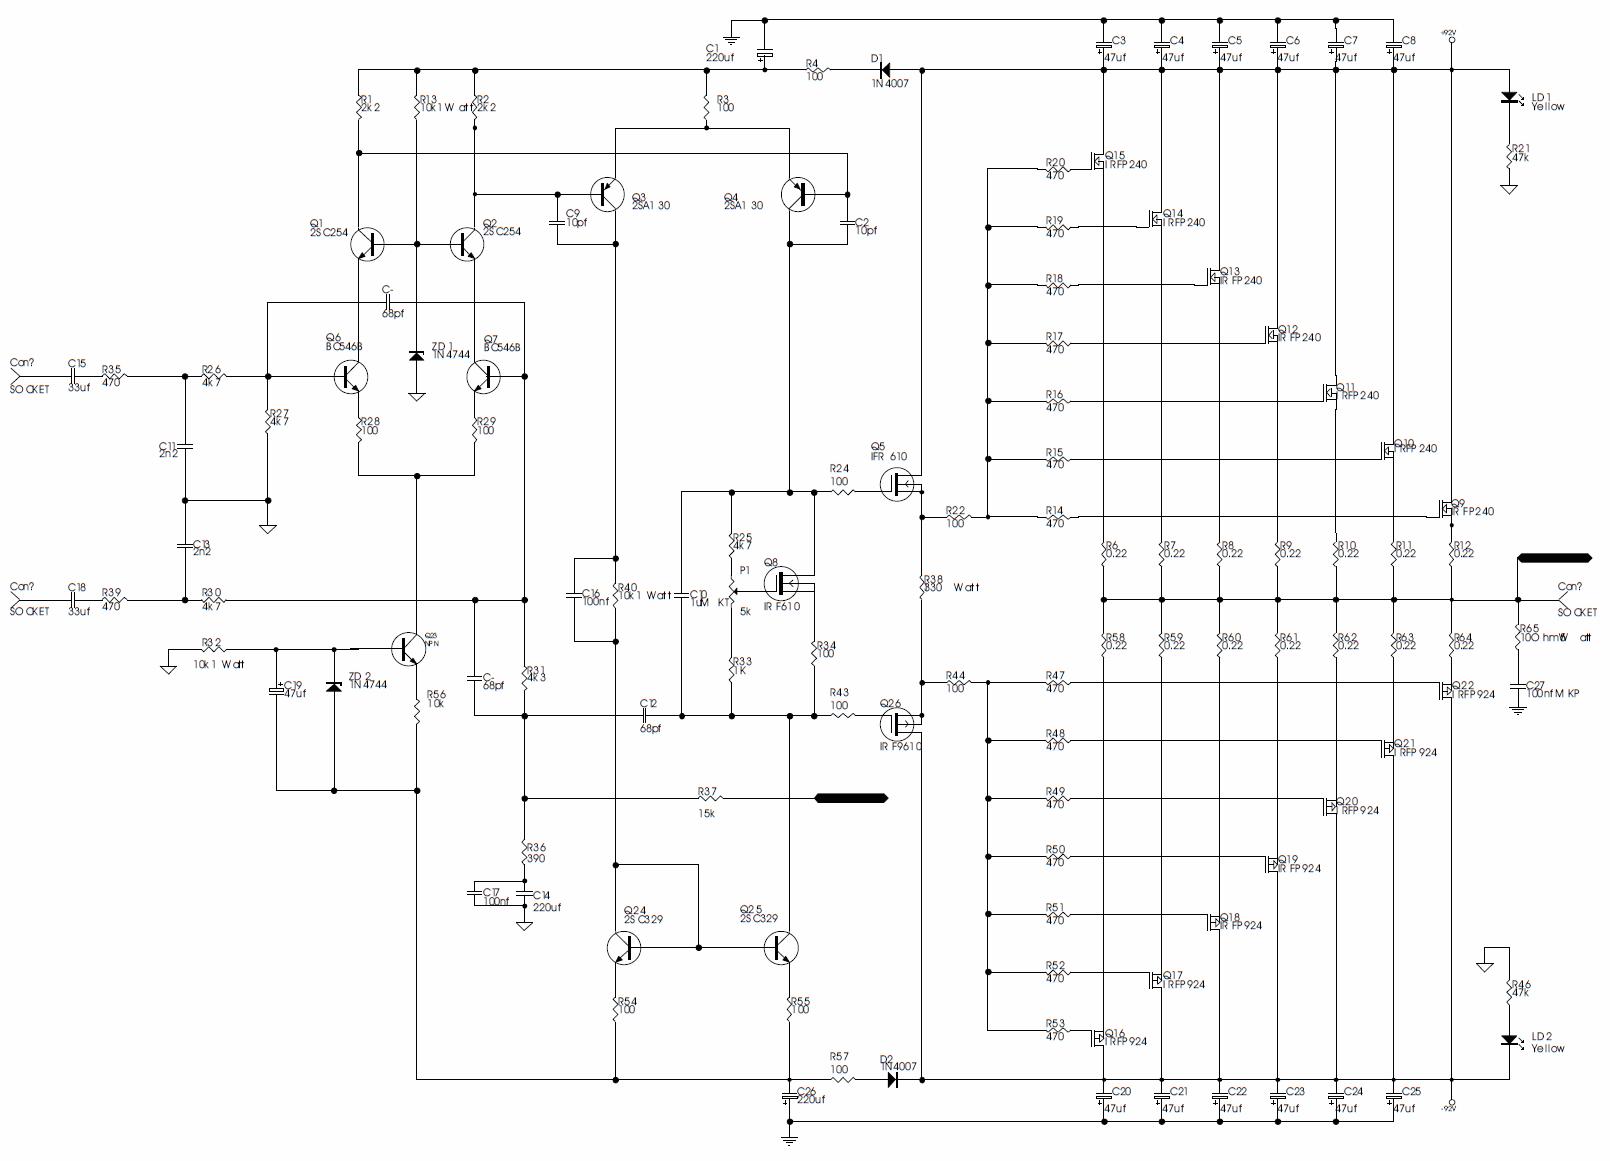 Irfp240 Irfp9240 Ile 800w Mosfet Anfi Devresi Elektronik Devreler Pro Examples Proteus Isis Circuits Picbasic 120x120 Amfi Devre Emas